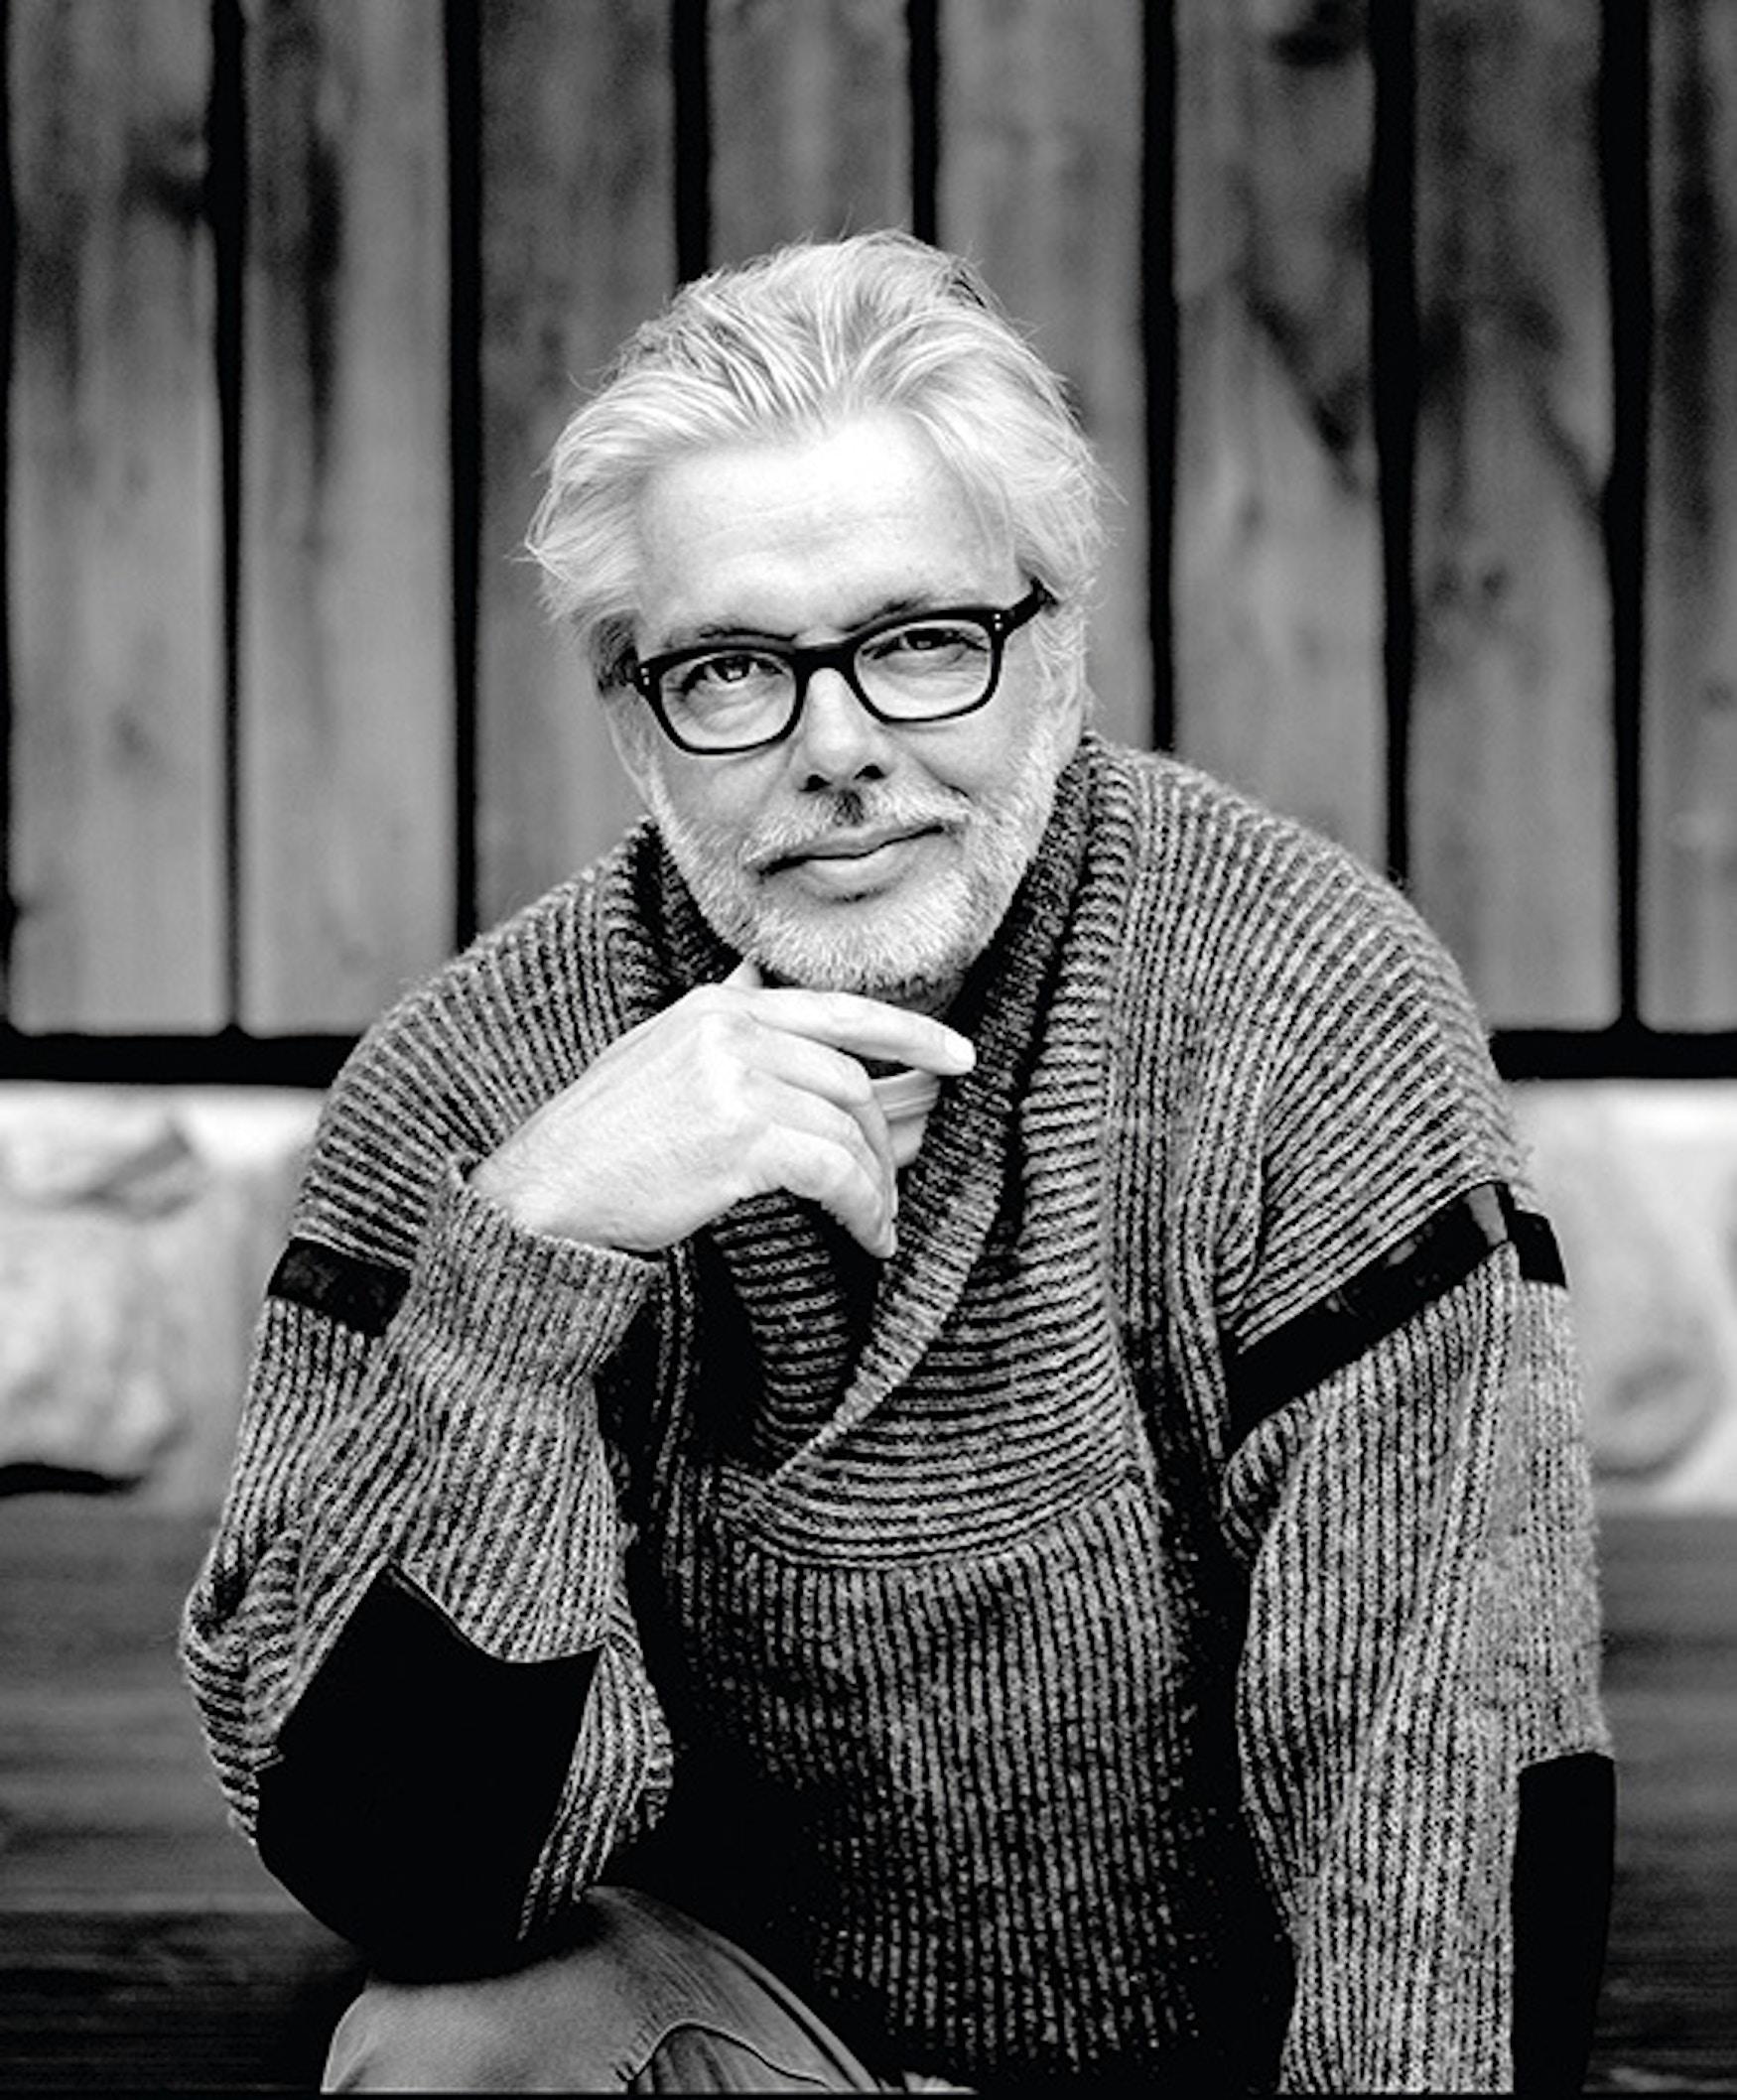 Conductor Jukka Pekka Saraste.